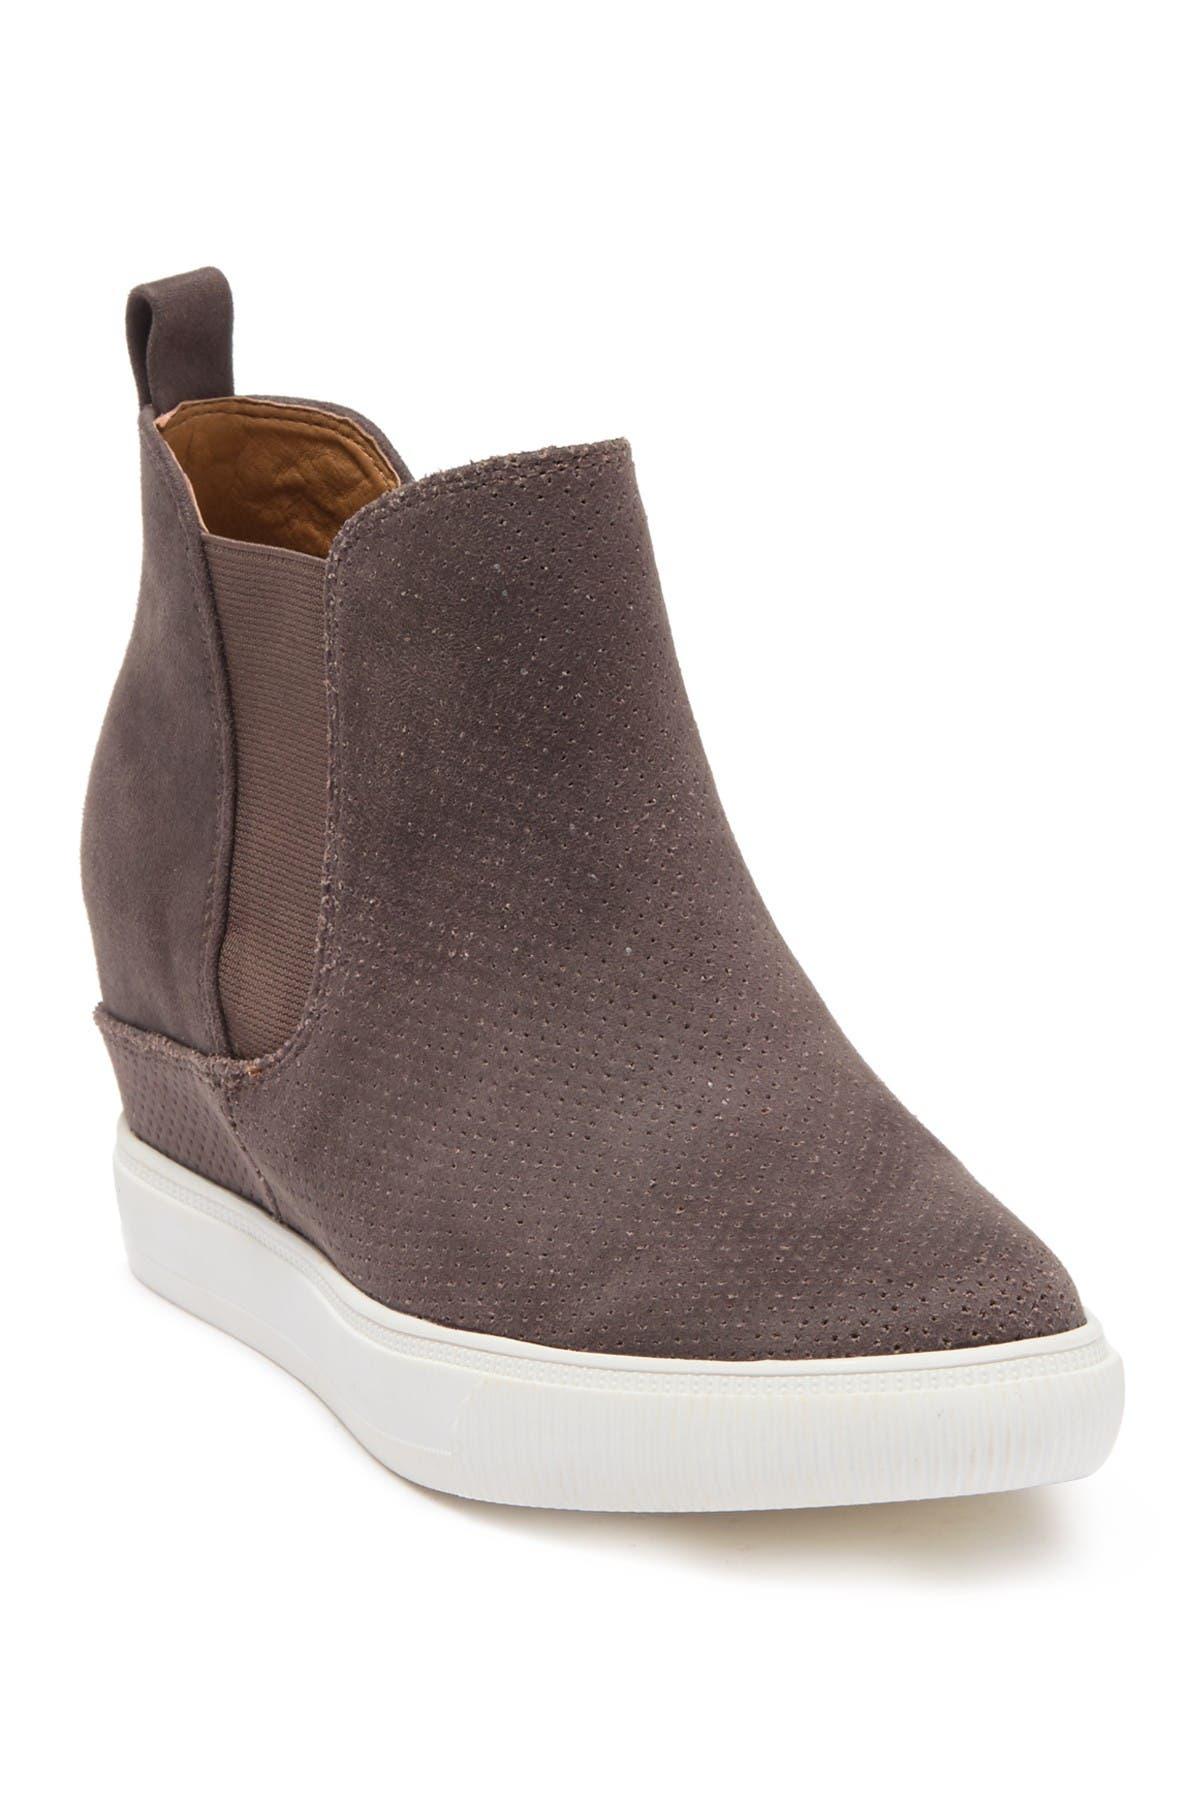 Image of DV DOLCE VITA Kerry Platform Wedge Sneaker